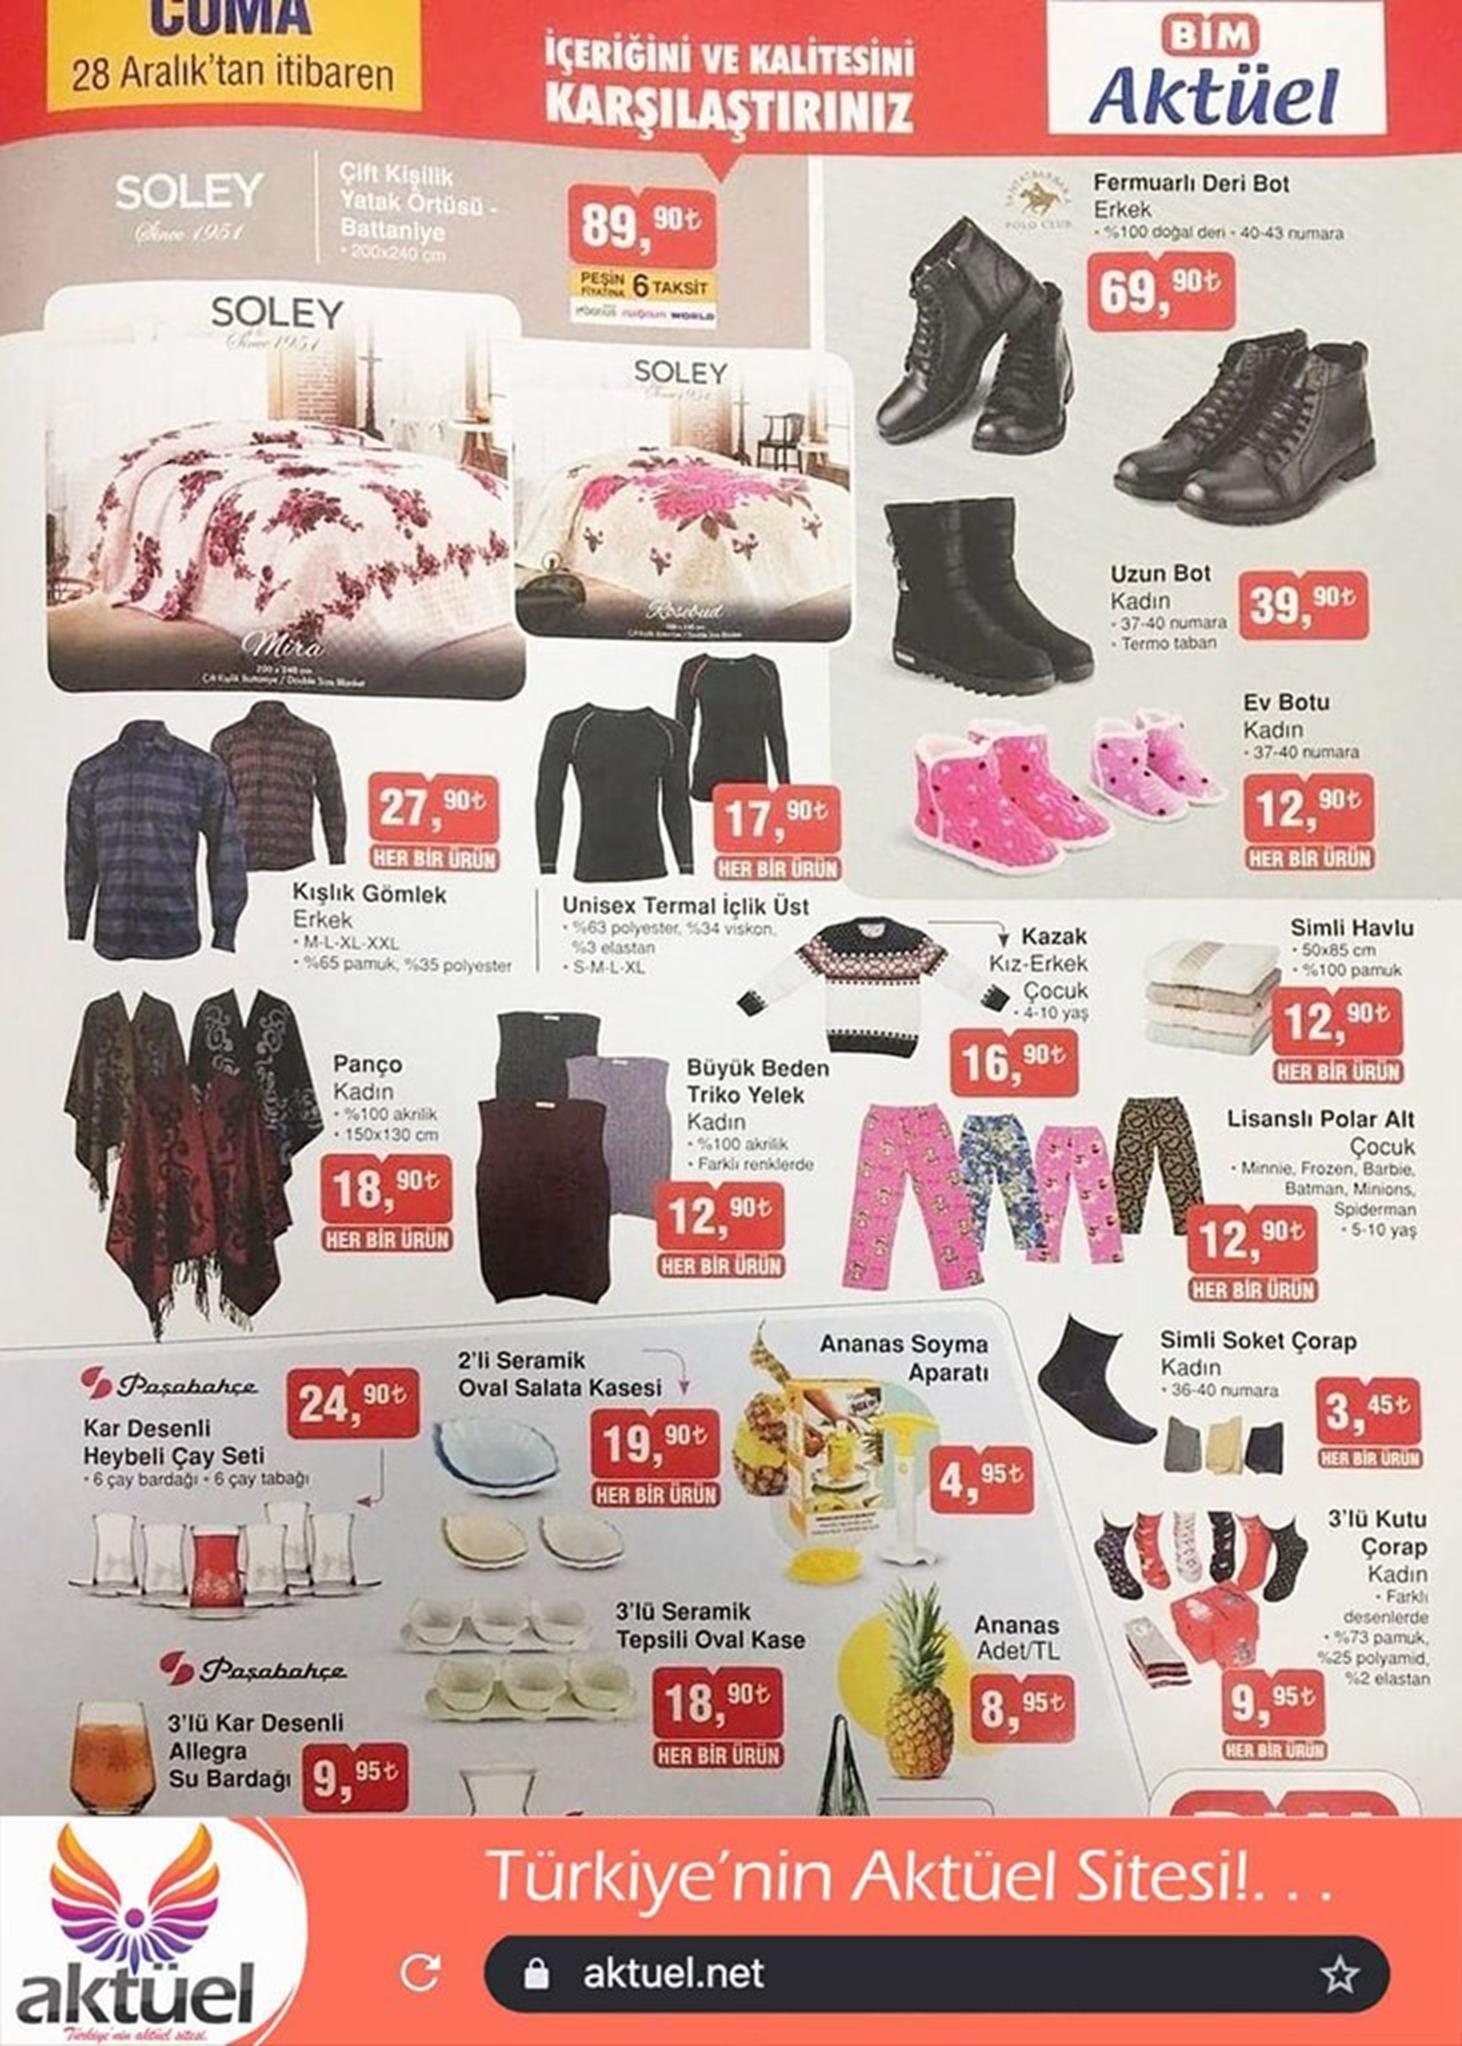 Bim Aktuel Urunler Firsatlari Kacirmayin In 2020 Bim Shopping Tan